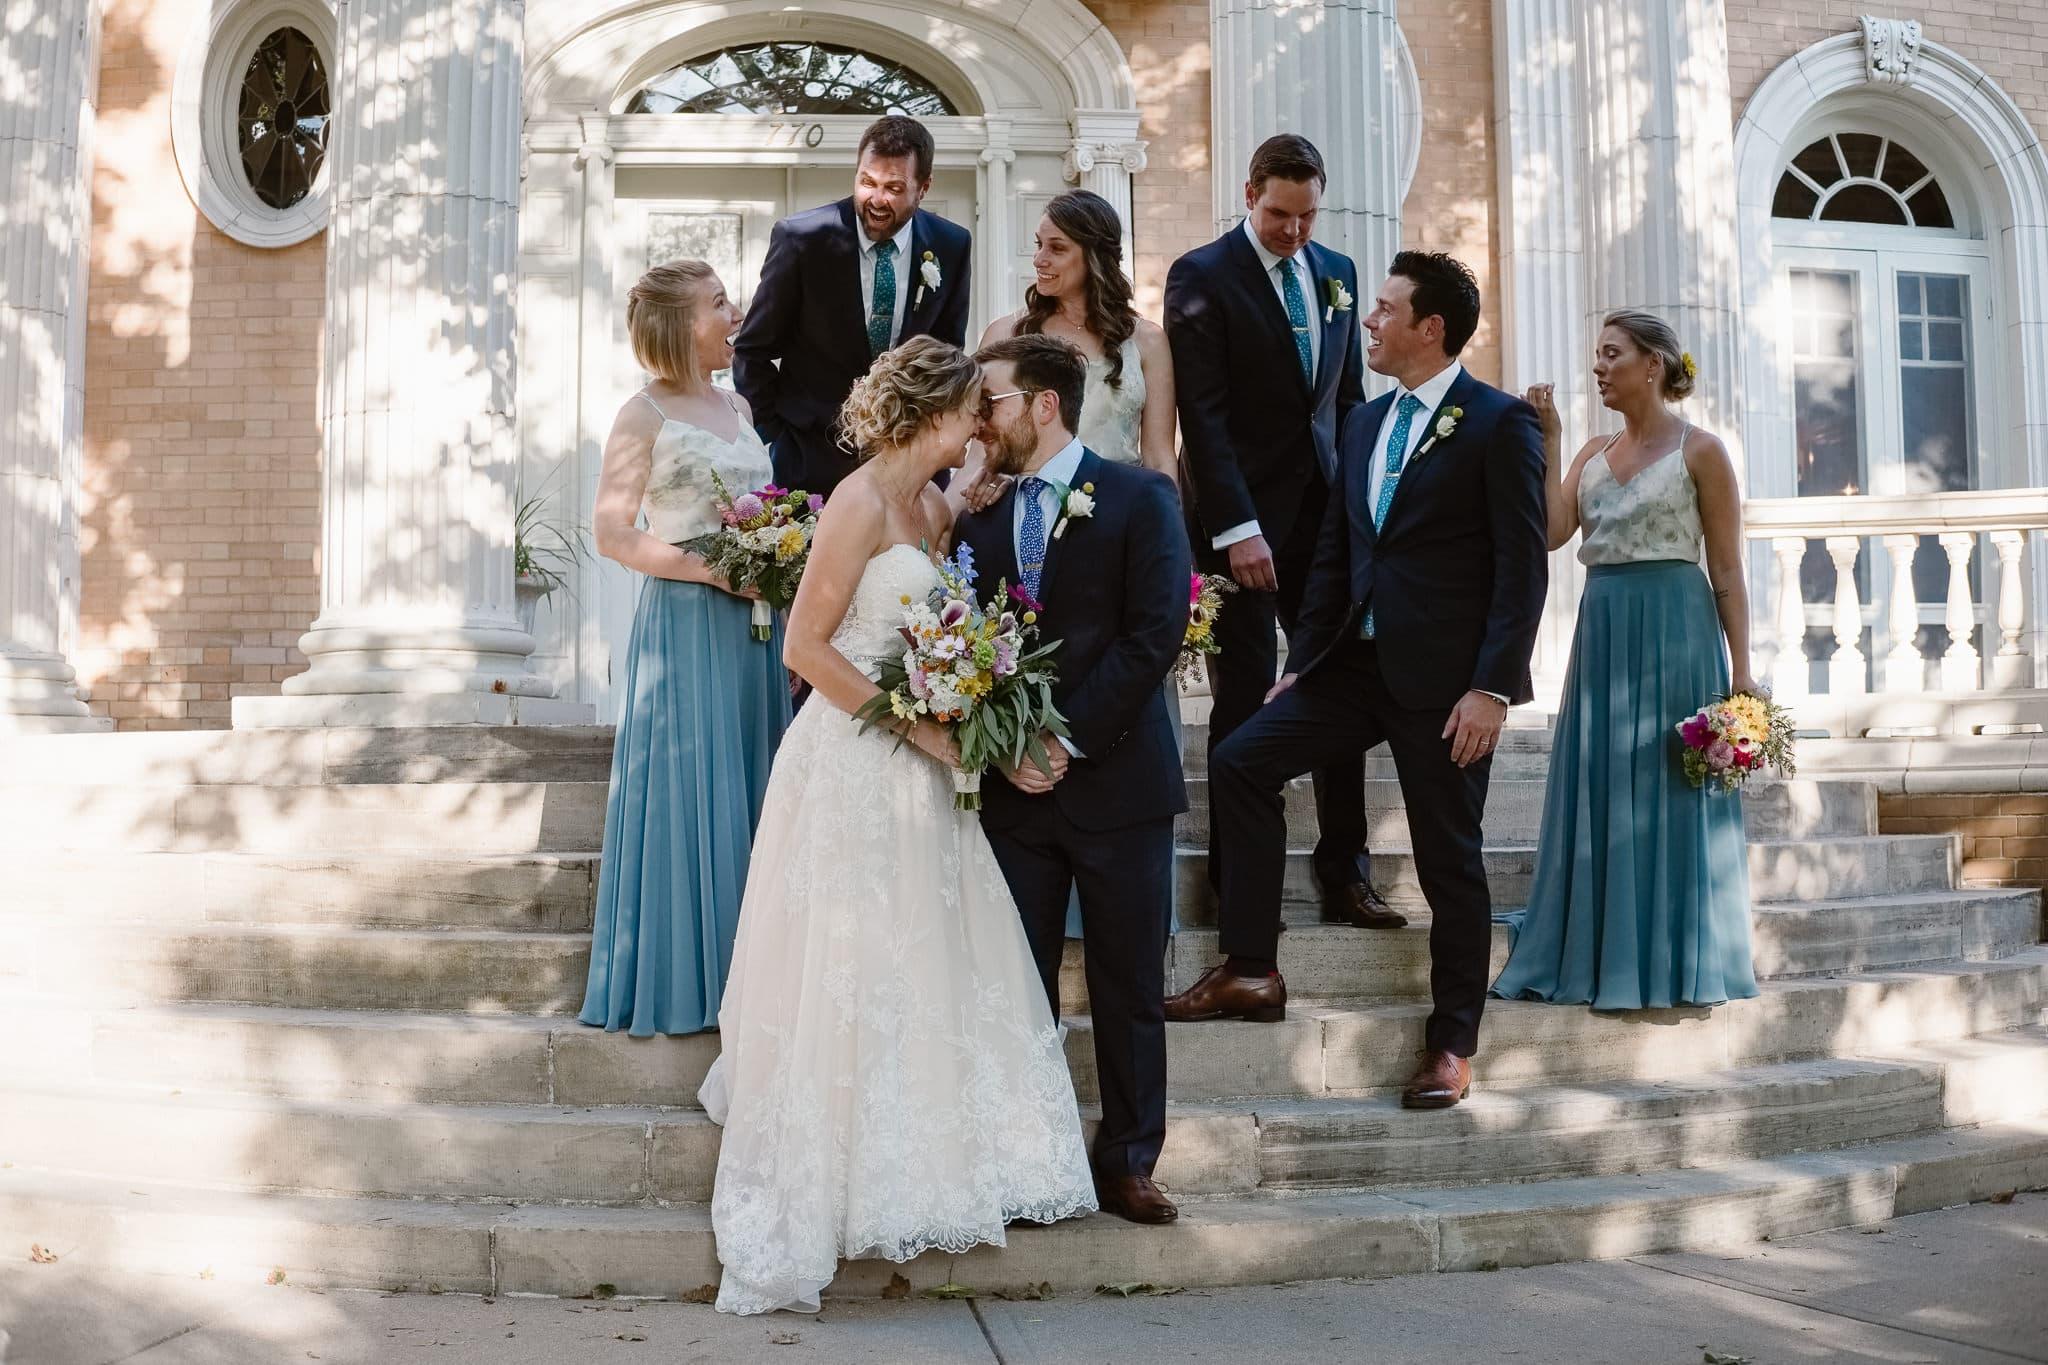 Grant Humphreys Mansion Wedding Photographer, Denver wedding photographer, Colorado wedding photographer, wedding party photos